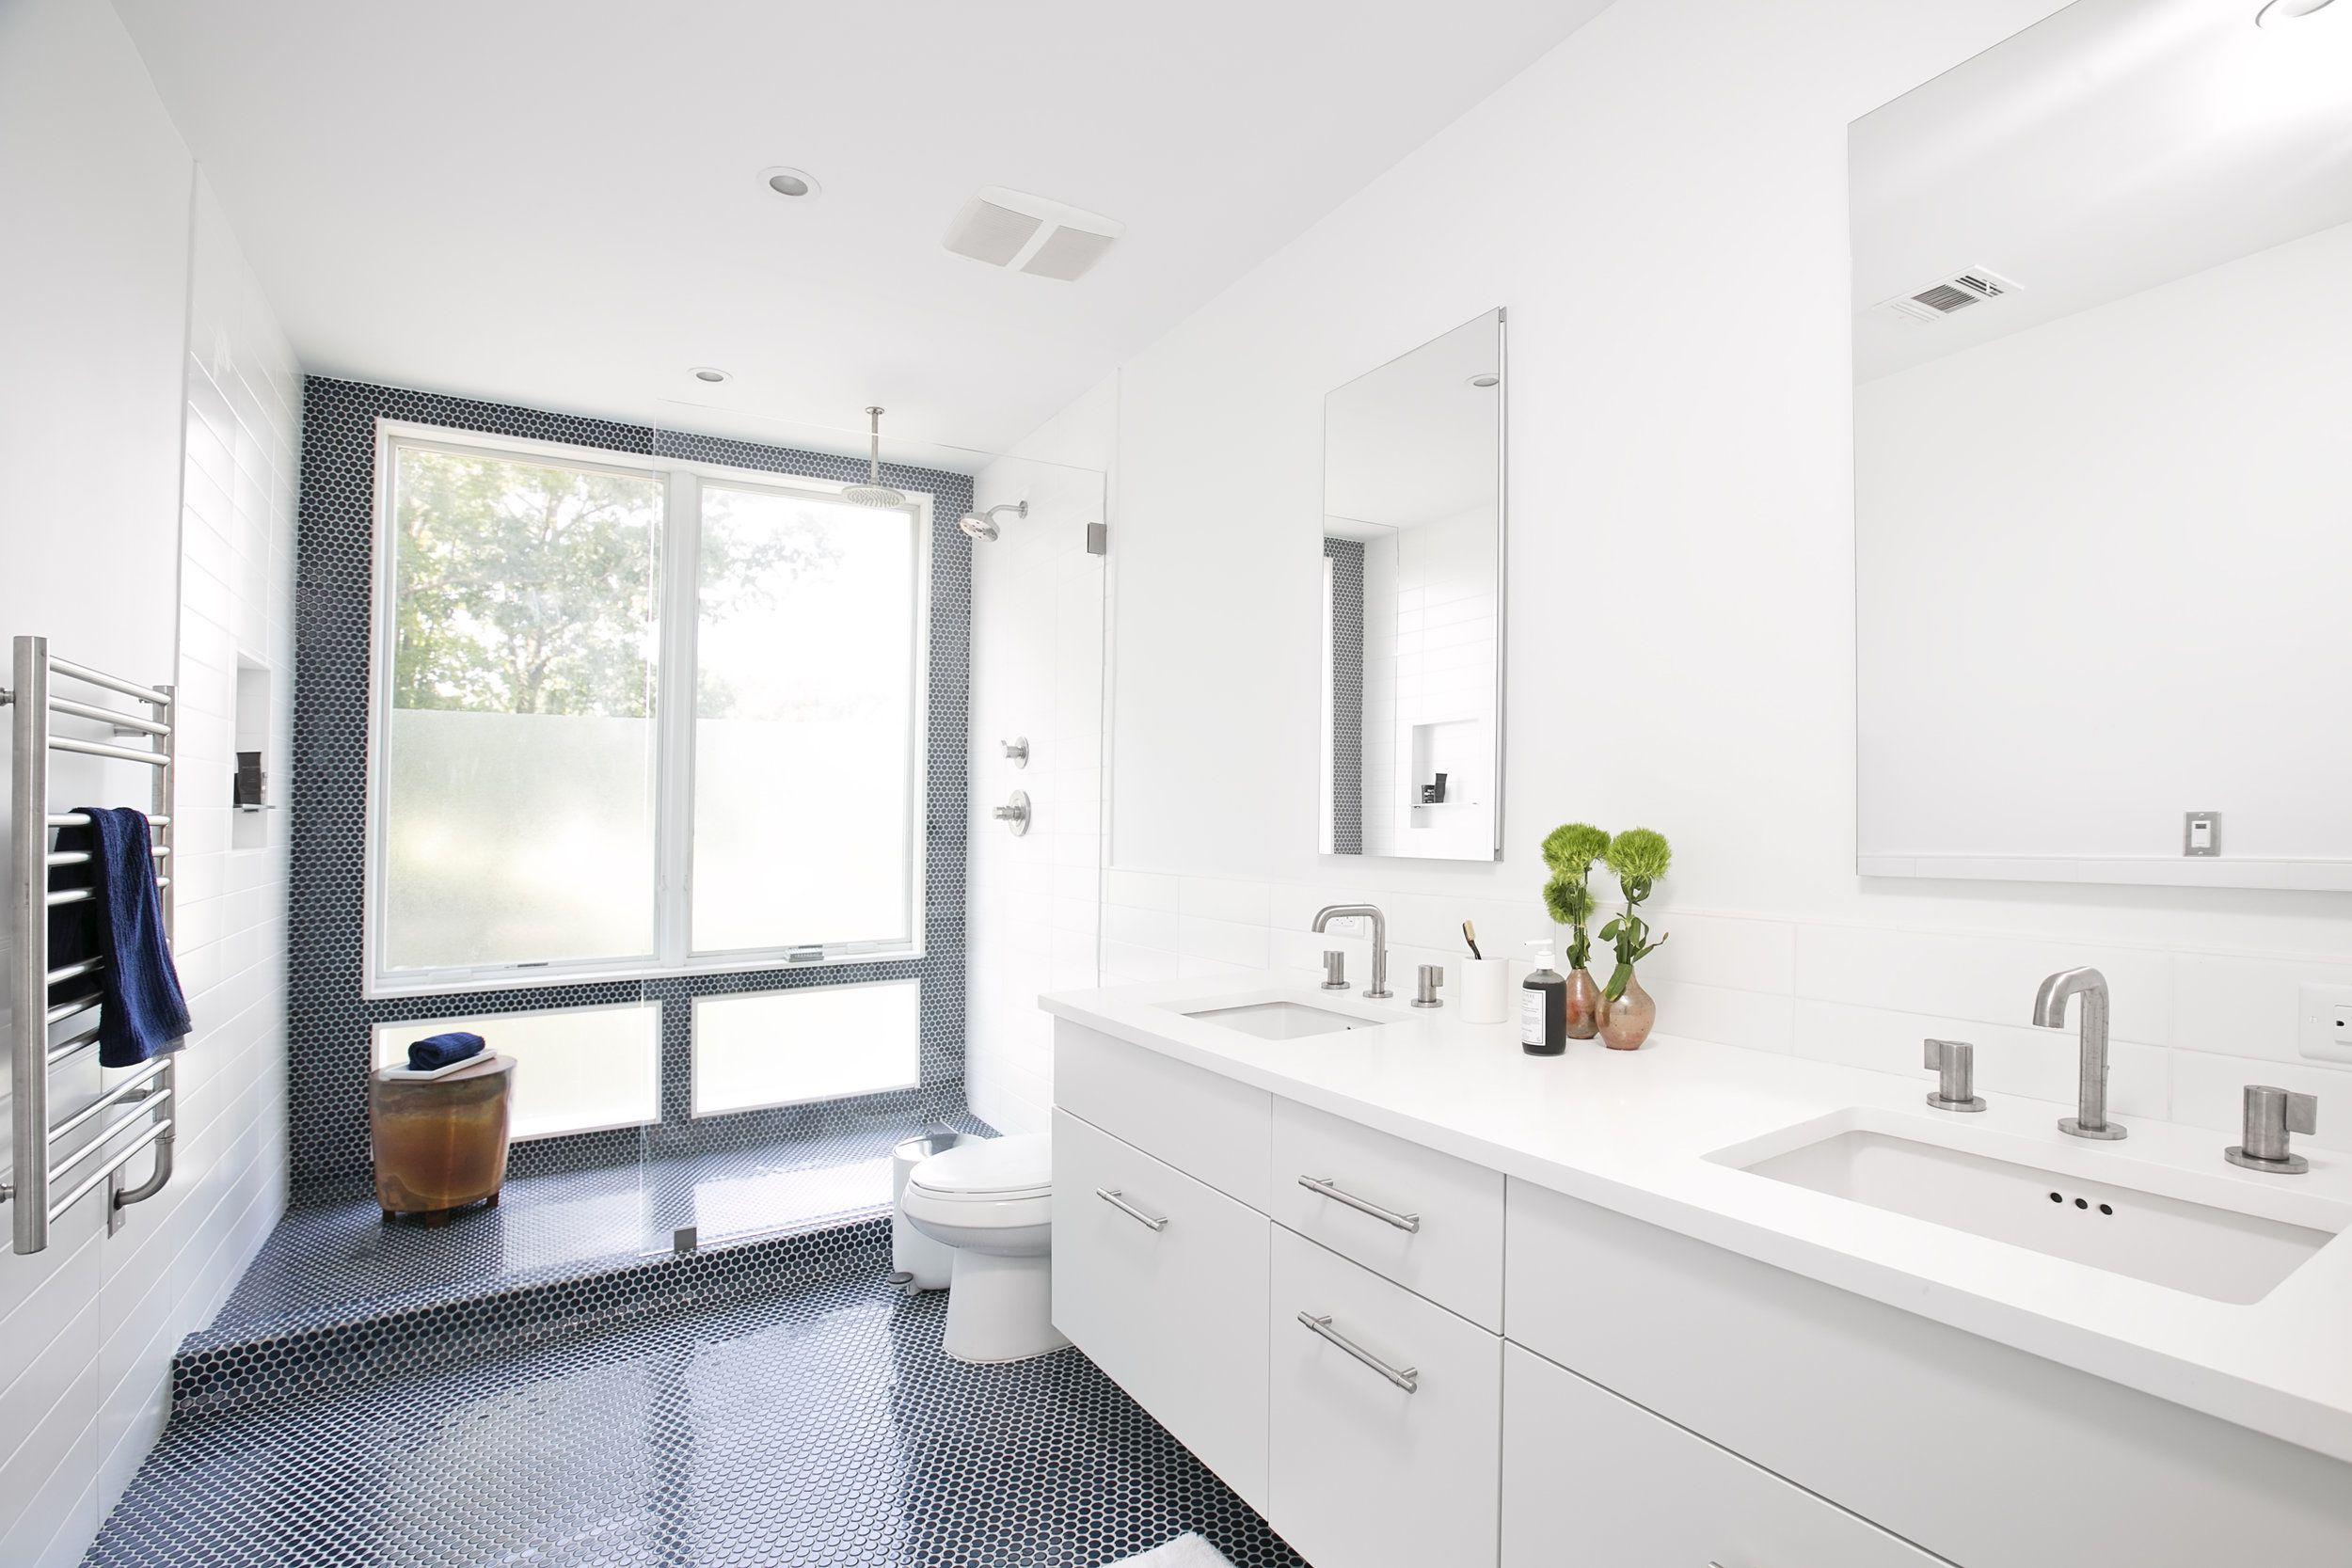 Best Wall Paint For Bathroom: 9 Best Bathroom Paint Colors